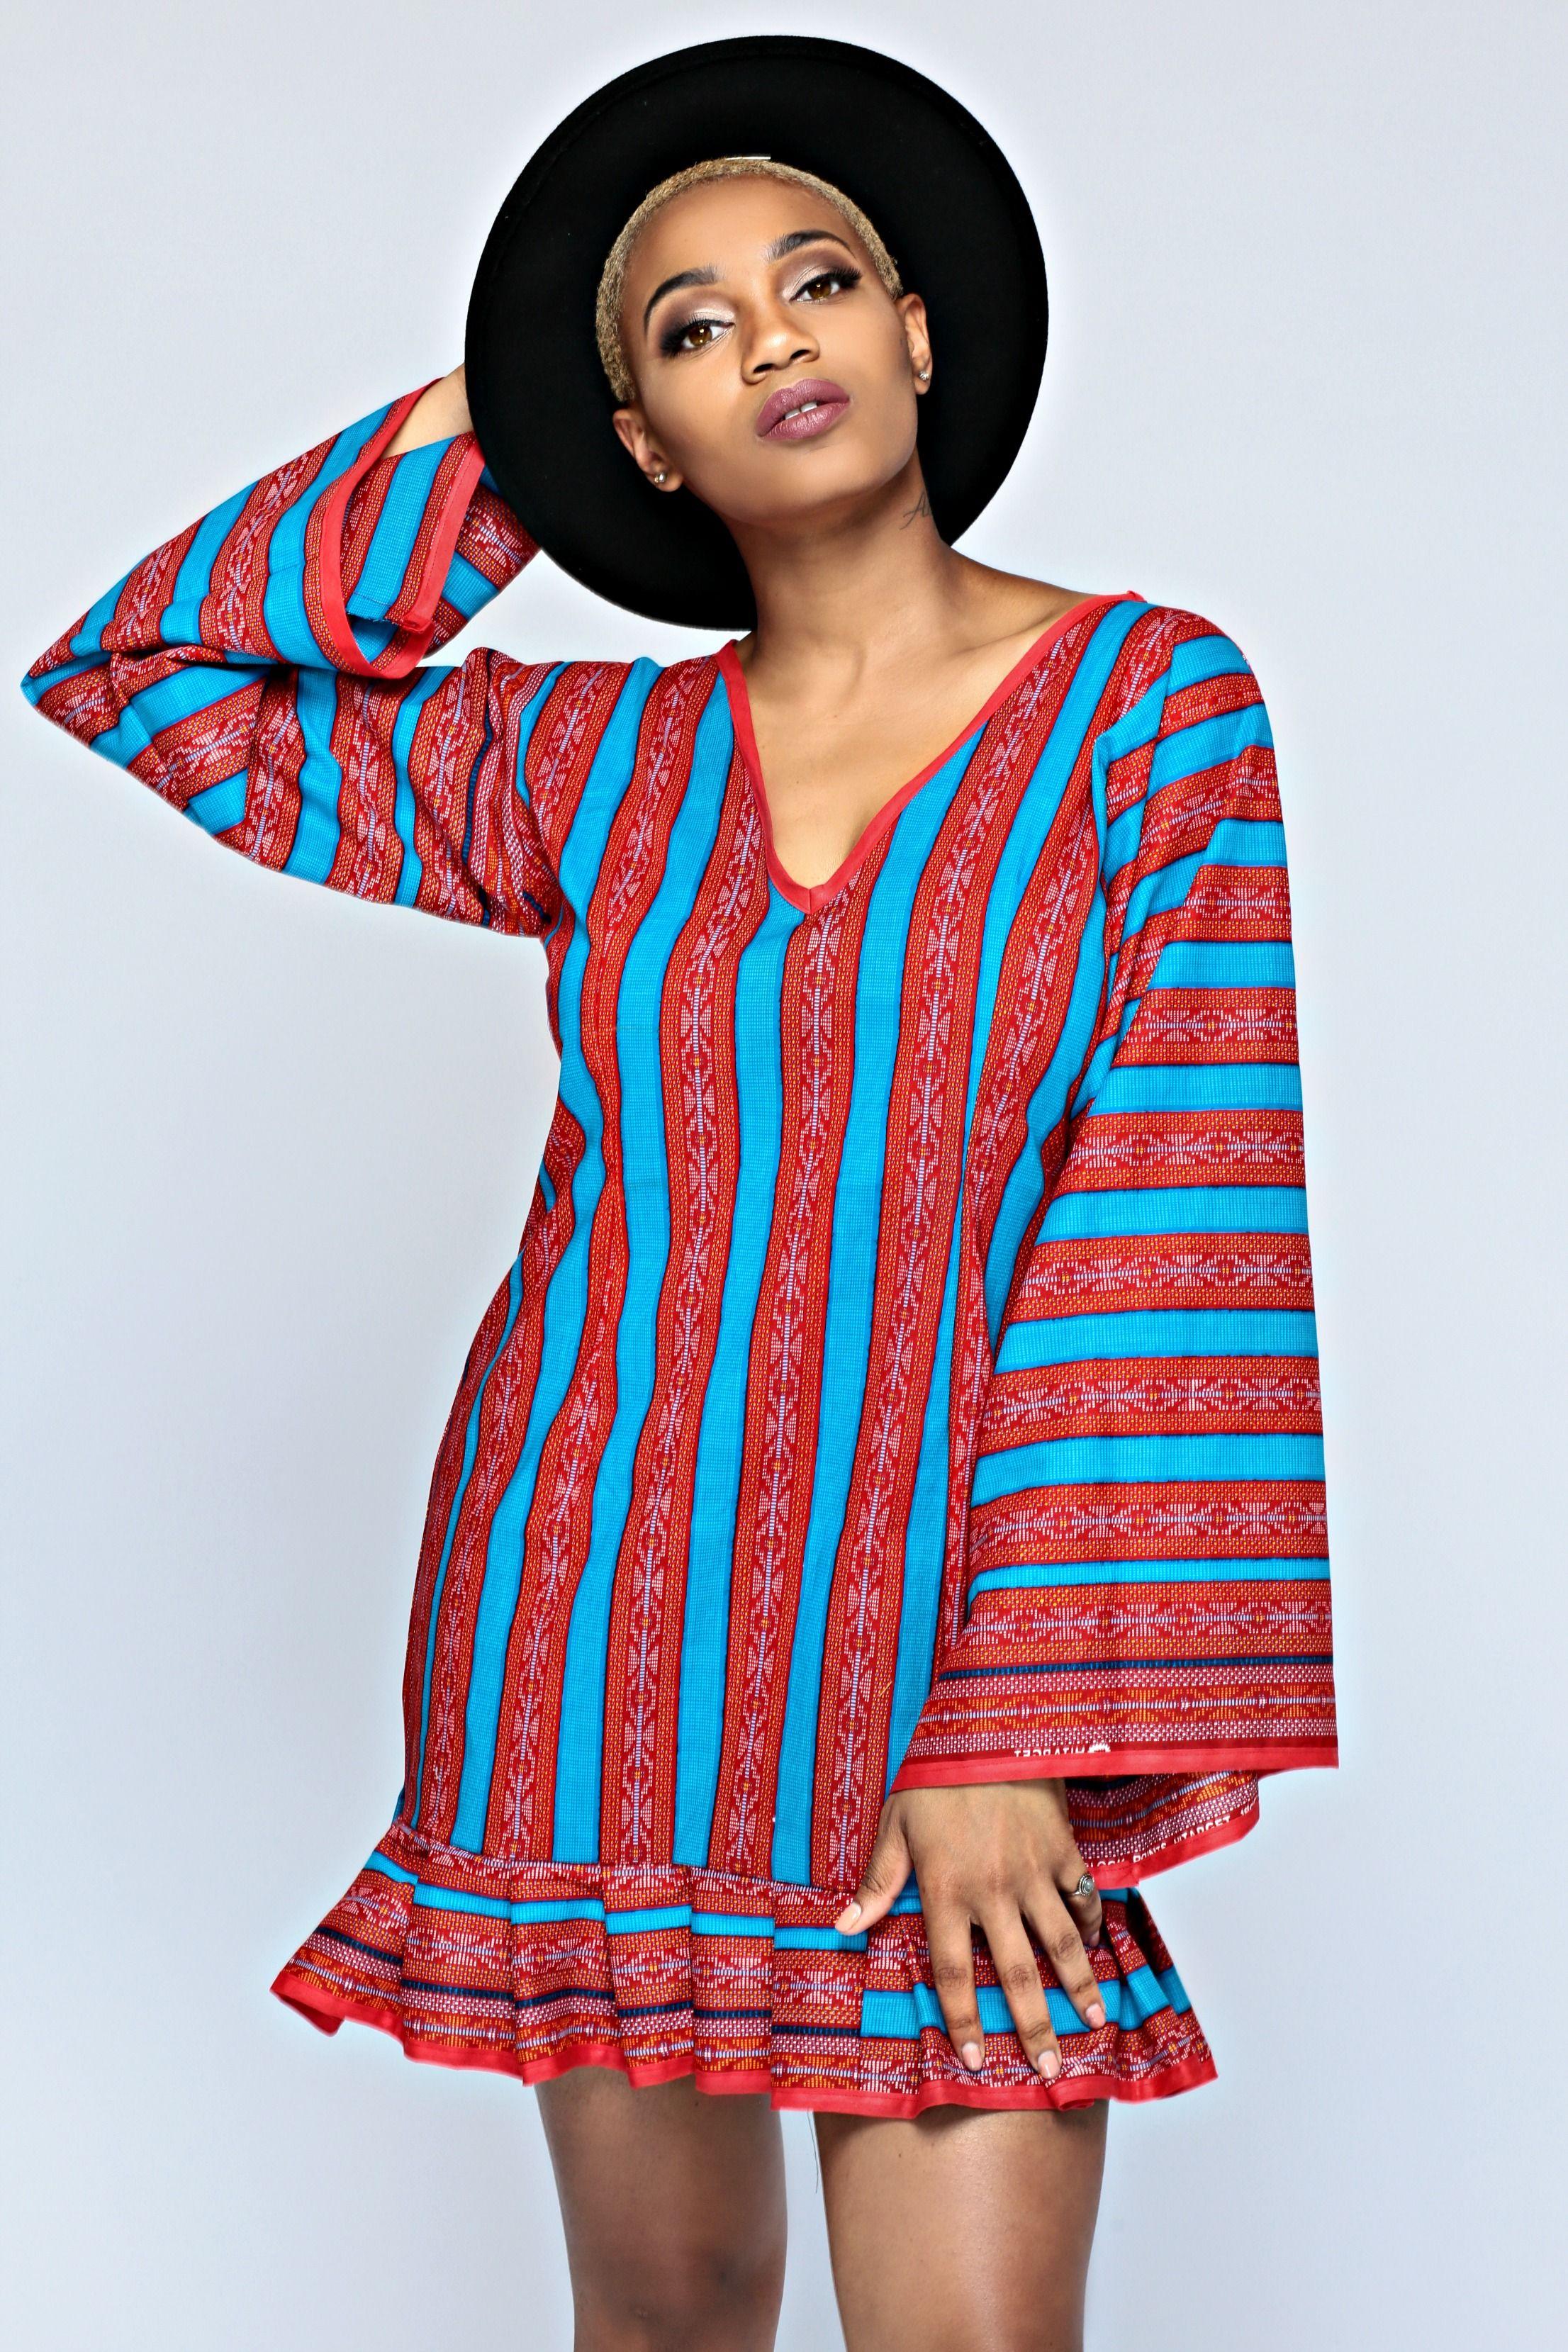 Menogu Designs - African Gown - short red Dress, Wedding, Style ...